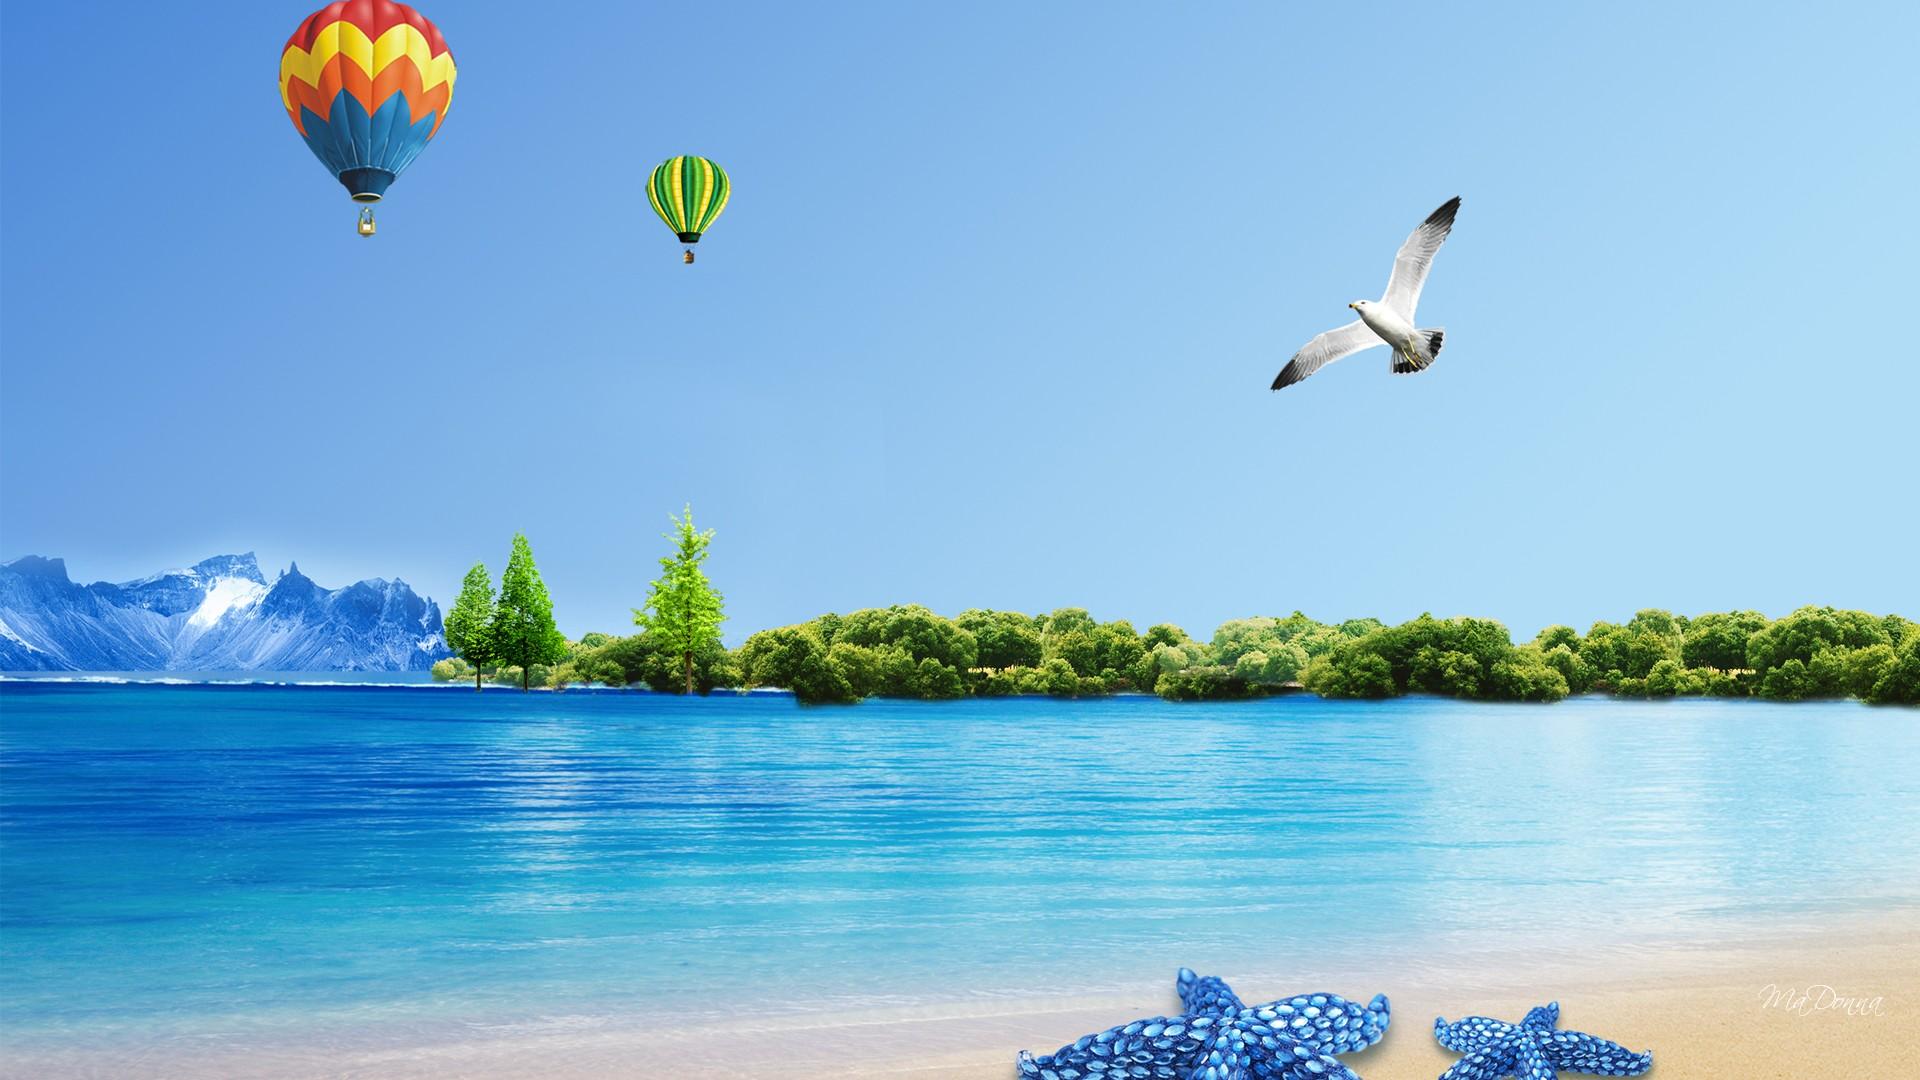 Summer Fun Balloon Nature 690263 1920x1080px W 2592   HD 1920x1080